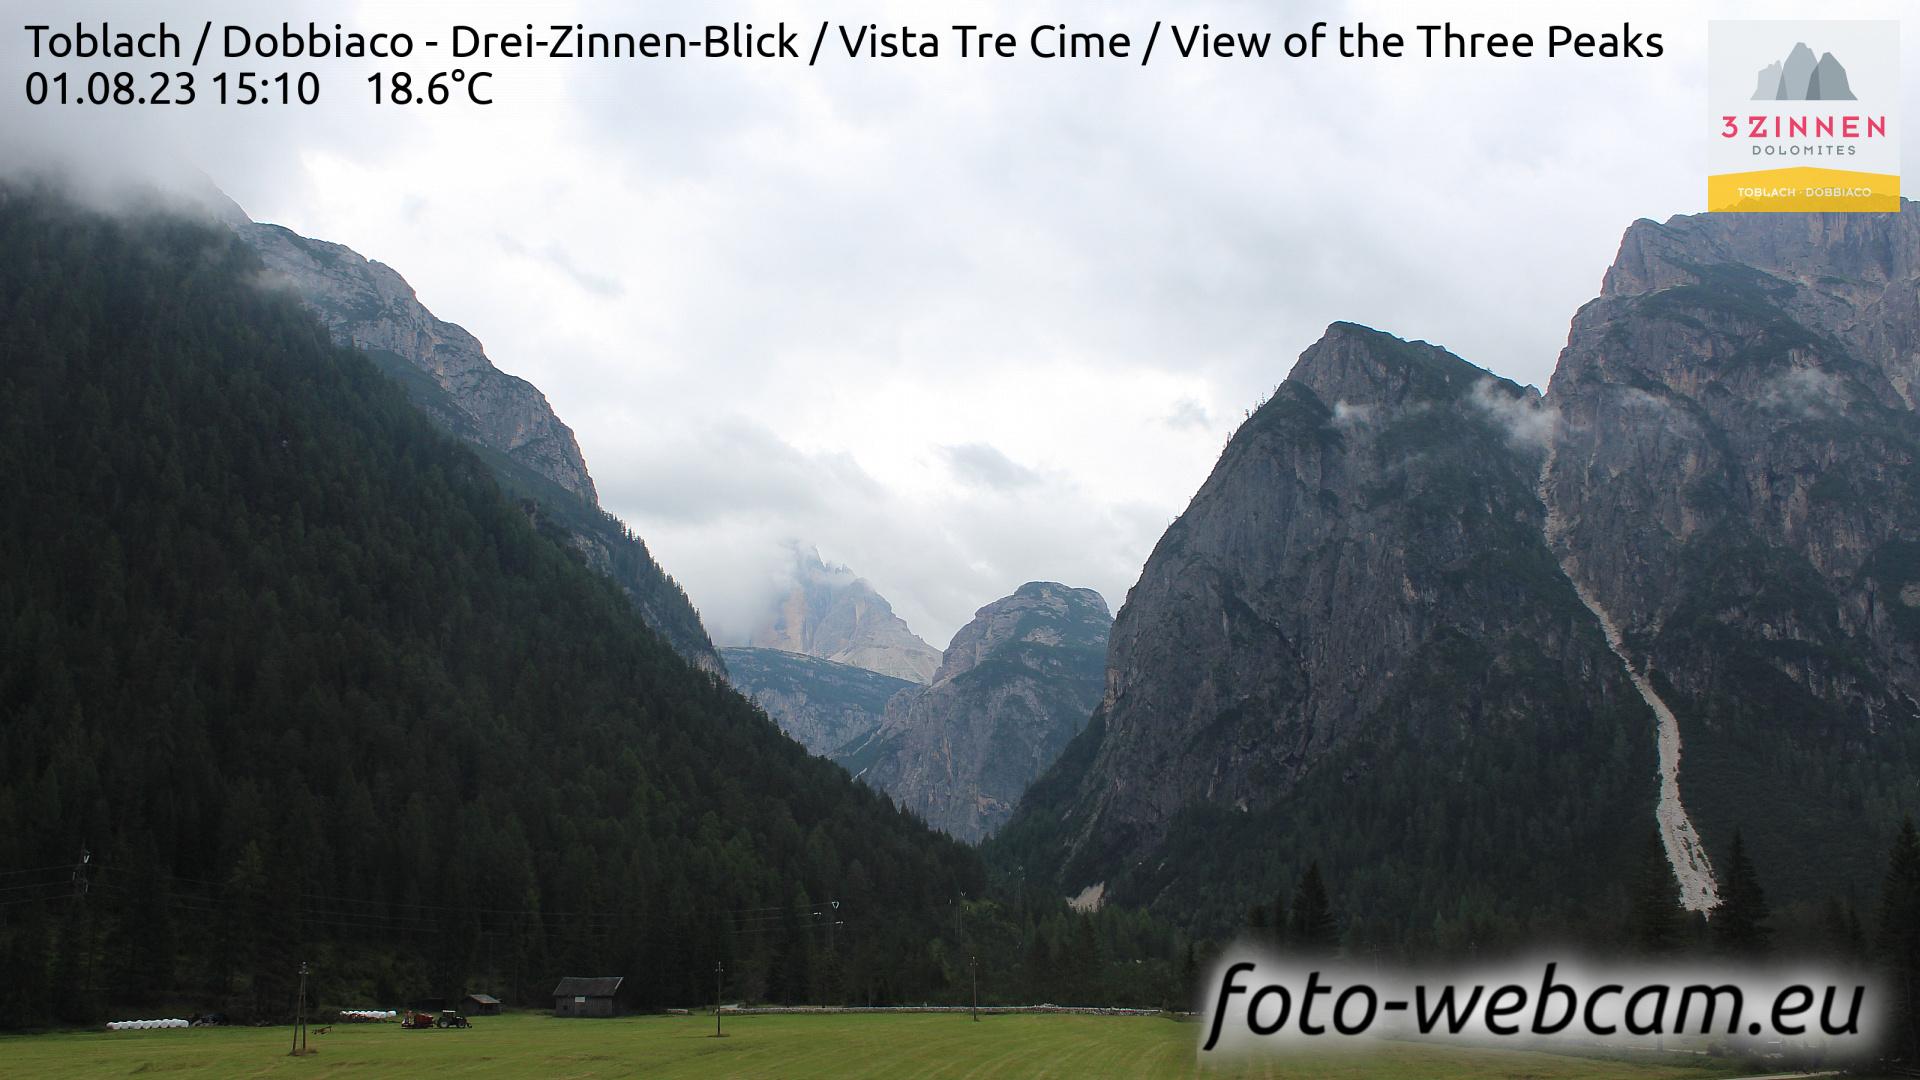 Toblach (Dolomiten) Do. 15:27